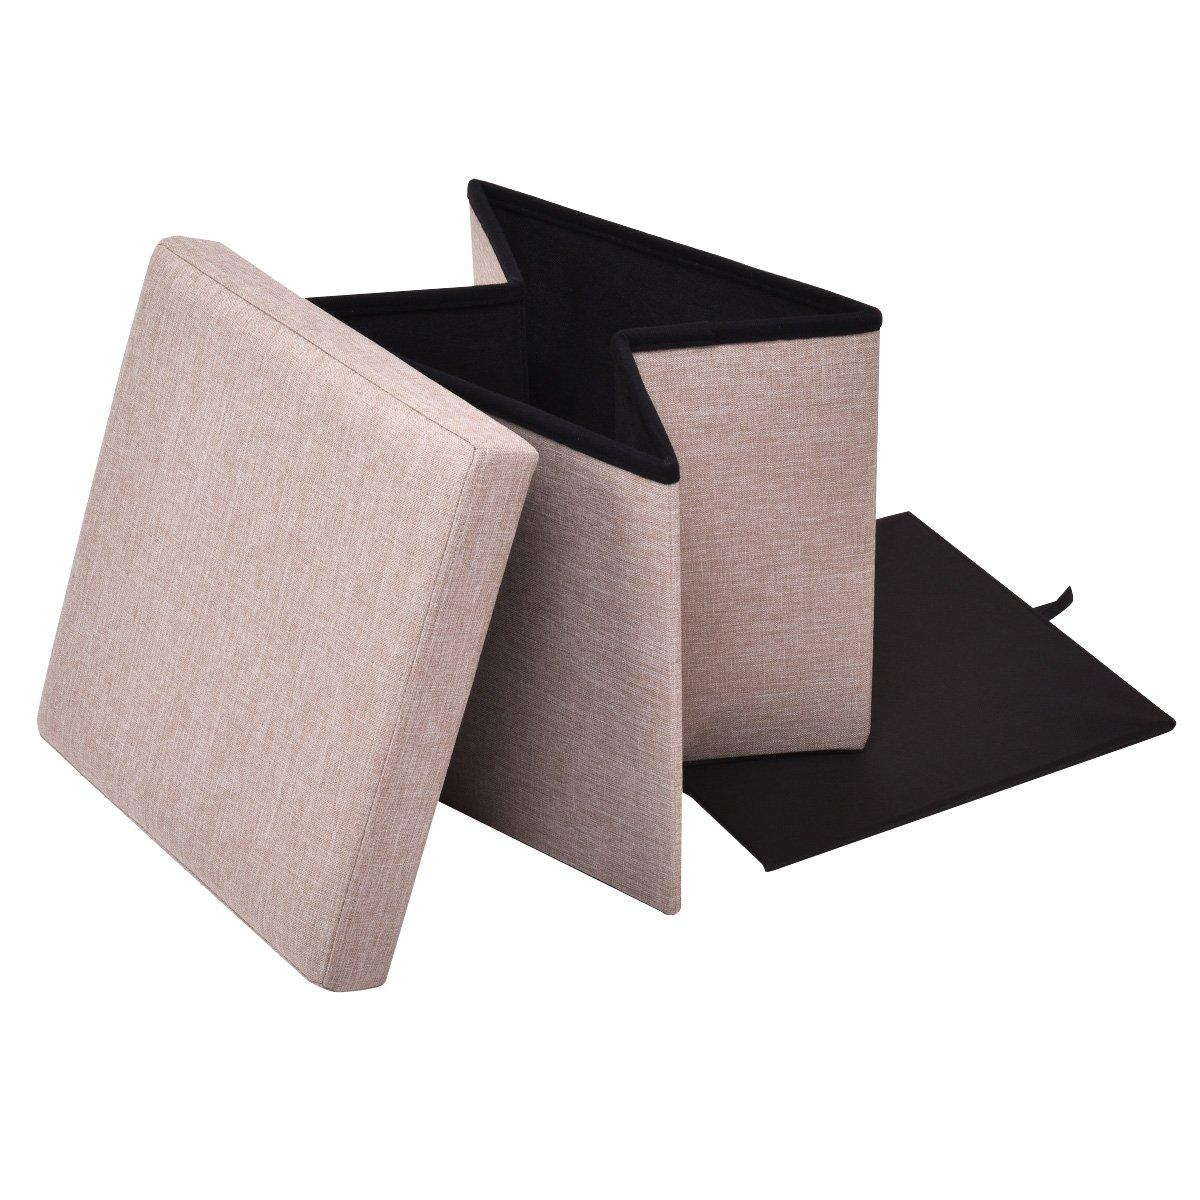 Amazon.com: Giantex taburete de cubeta banco de ...